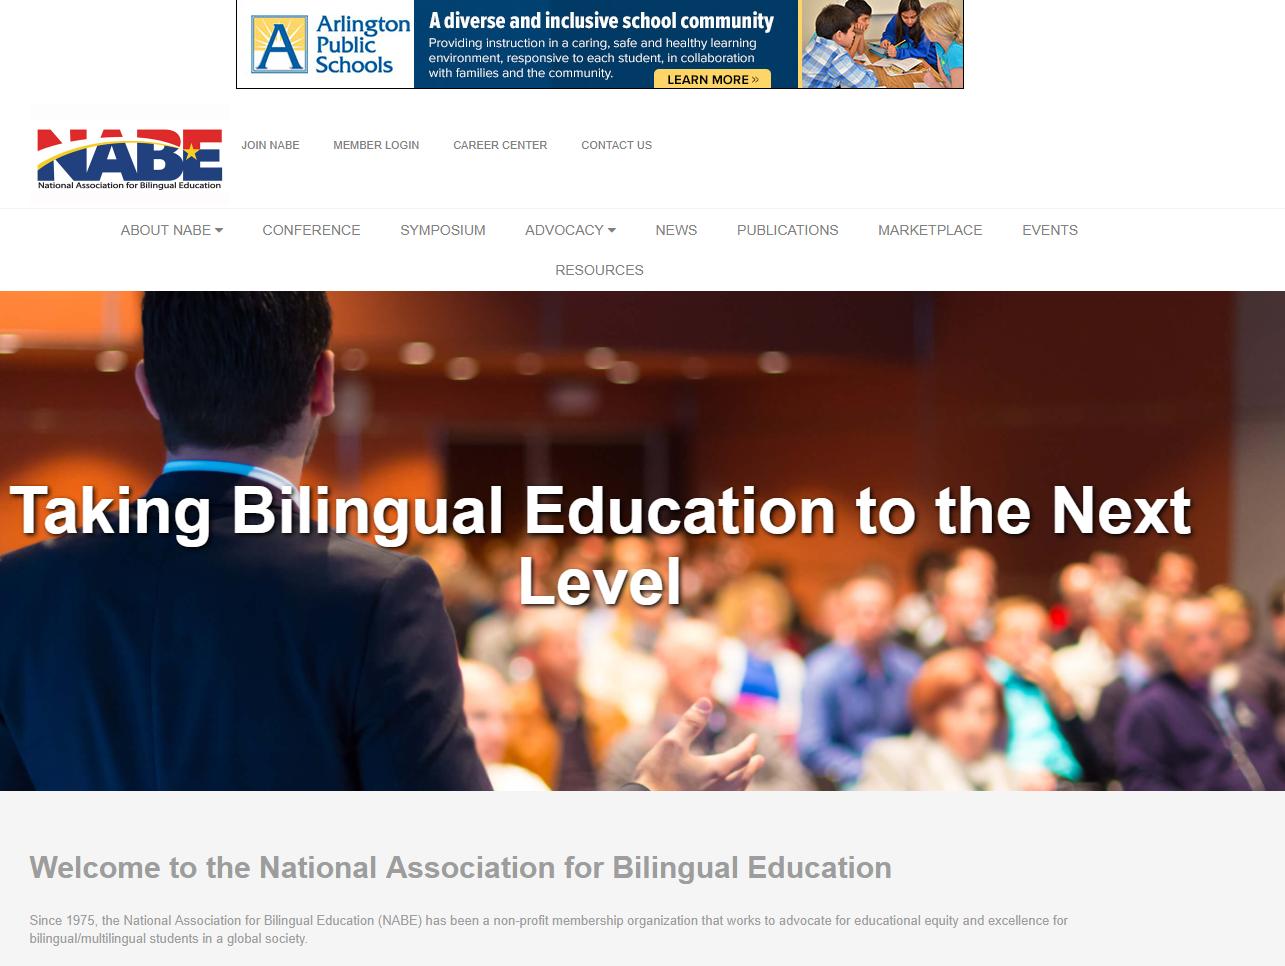 National Association for Bilingual Education